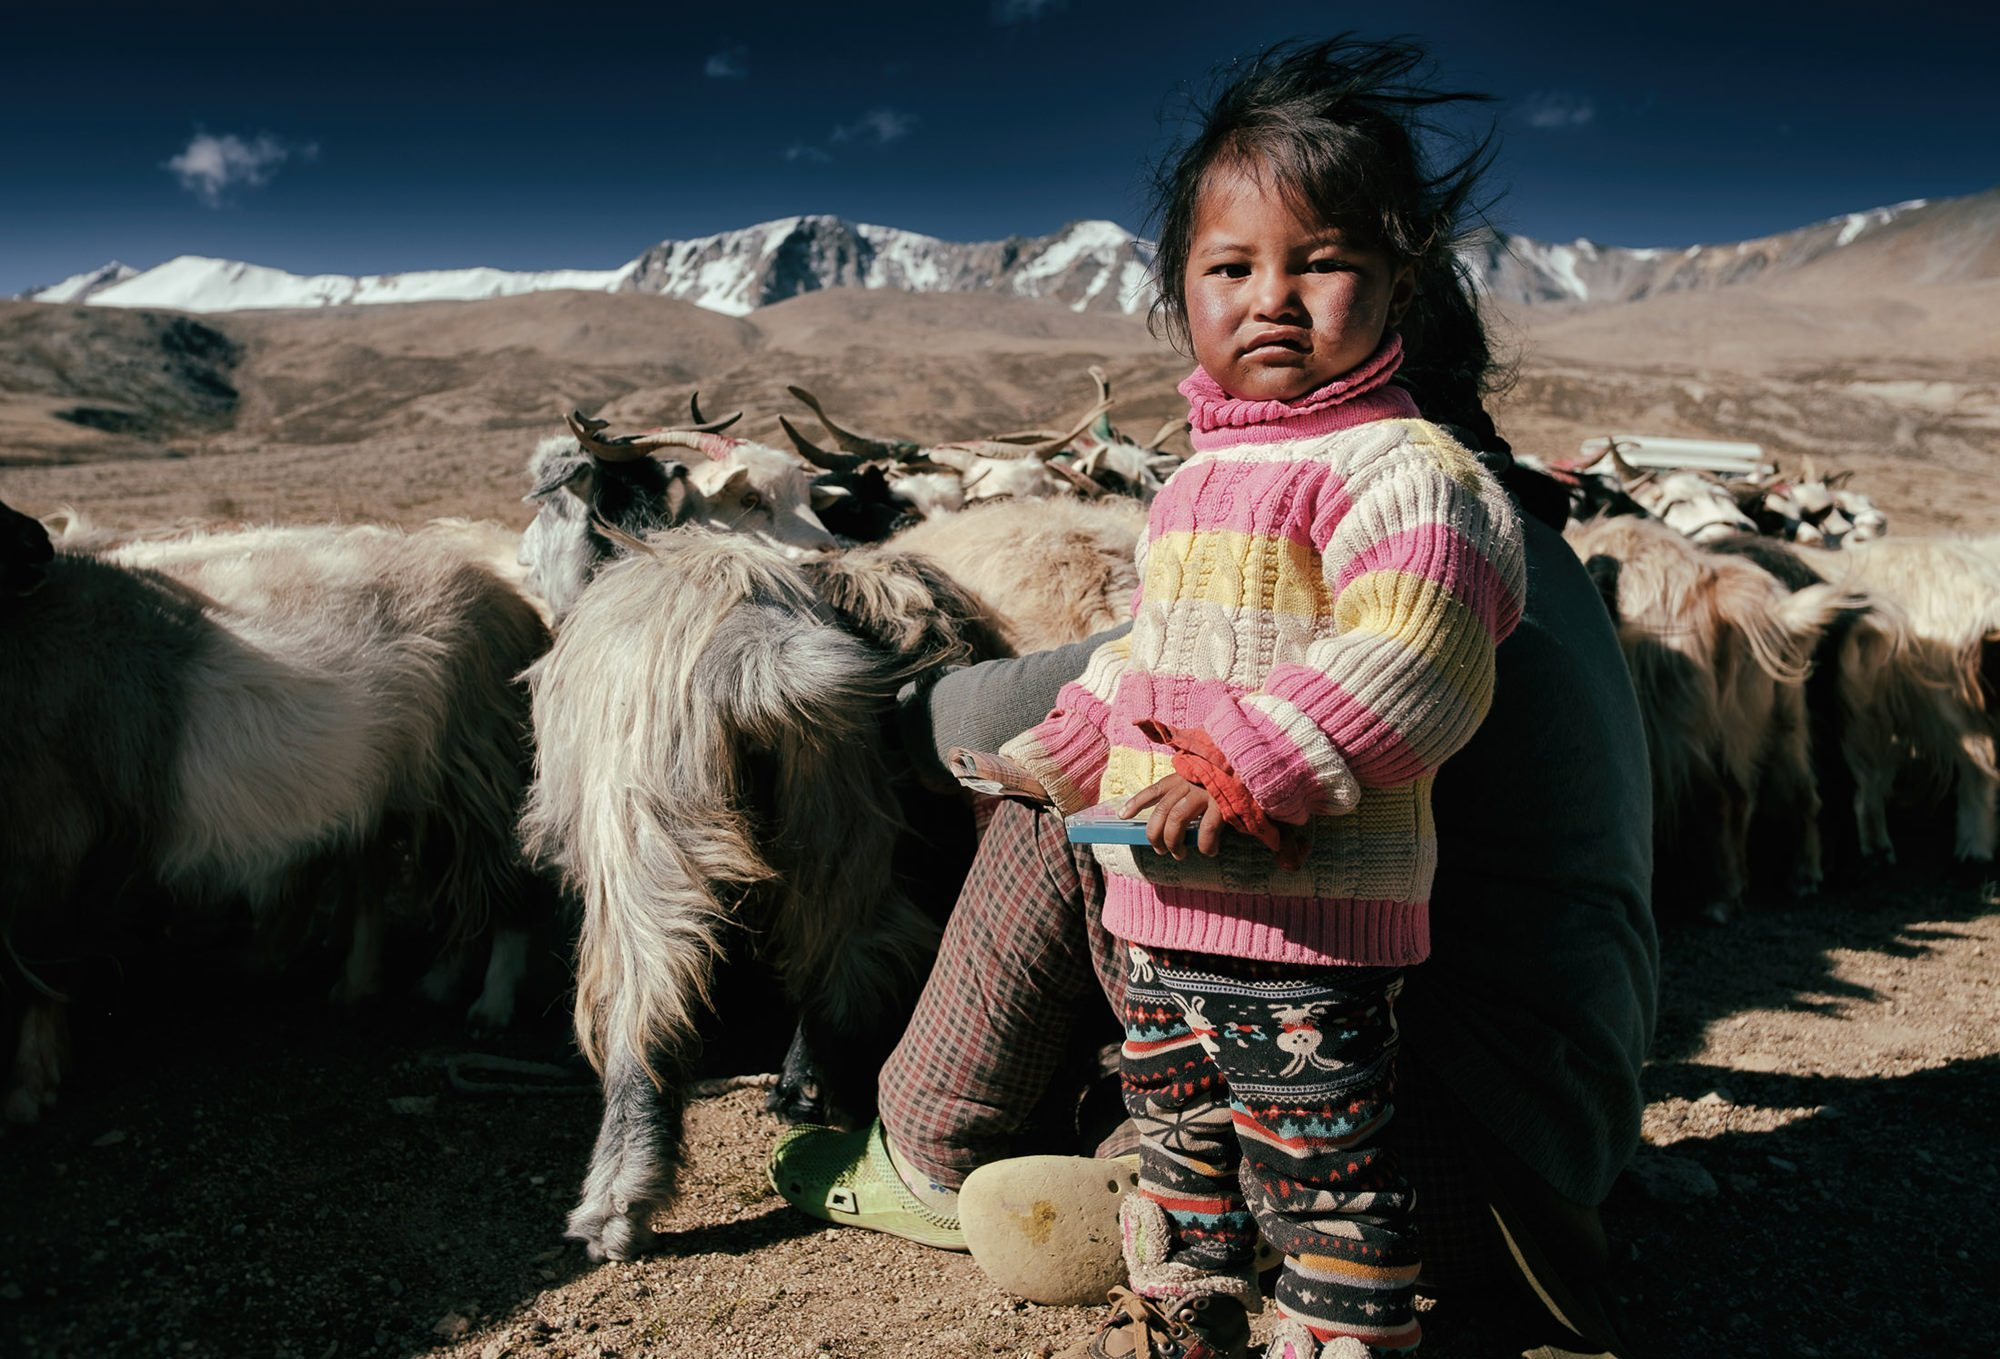 a young Changpa girl helps her mother milk the goats near Tso Moriri Lake, Ladakh © Hamish Scott-Brown